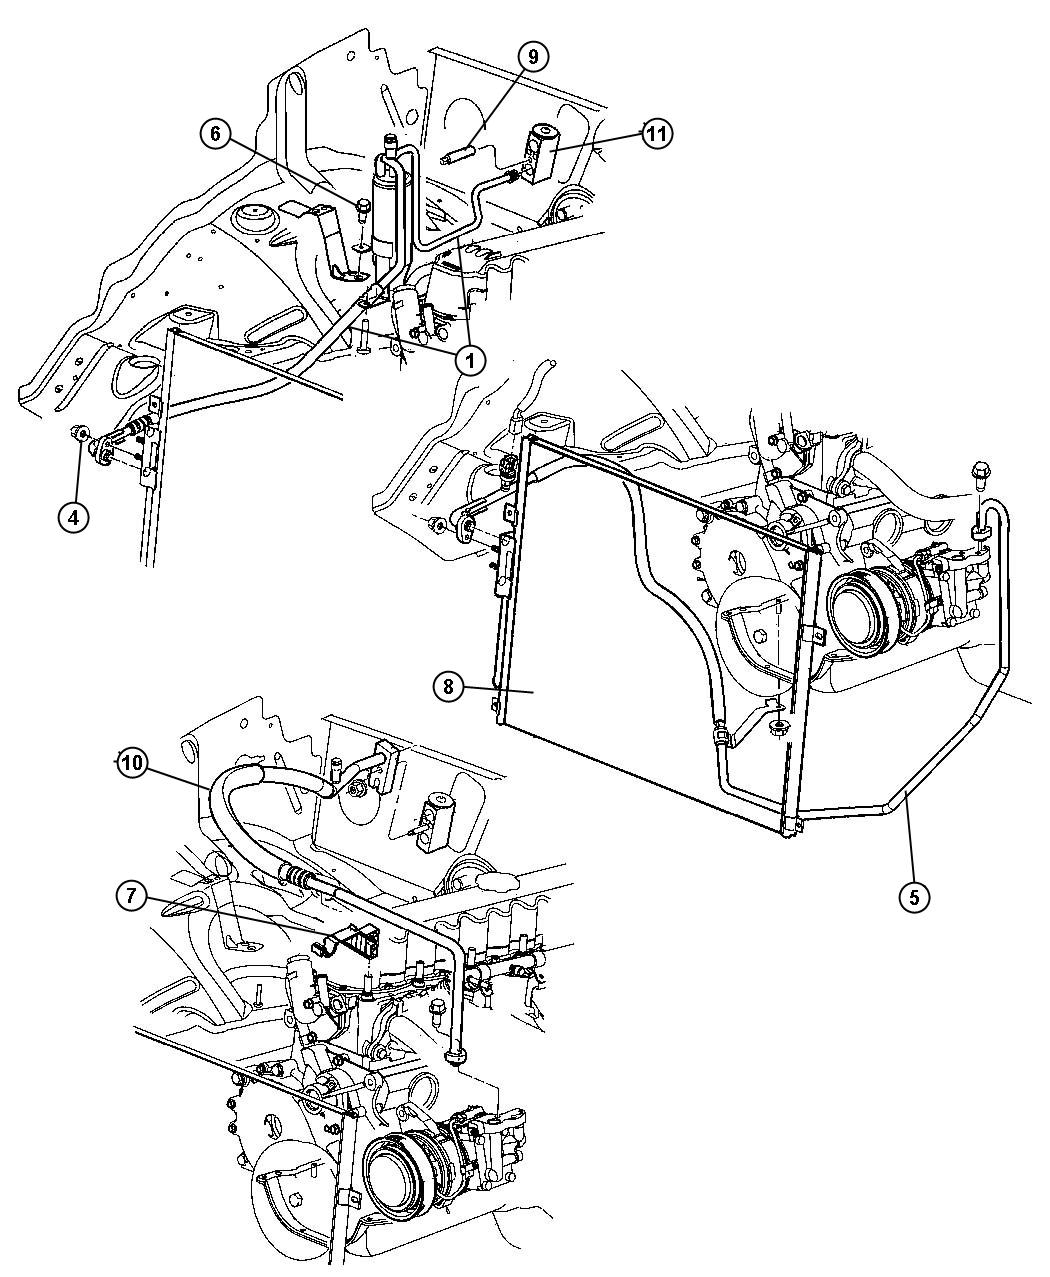 tags: #2004r wiring diagram#200r4 lock up wiring diagram#200r4 lockup wiring#700r4  tcc lockup wiring diagram#4l80e solenoid diagram#700r4 plug wiring